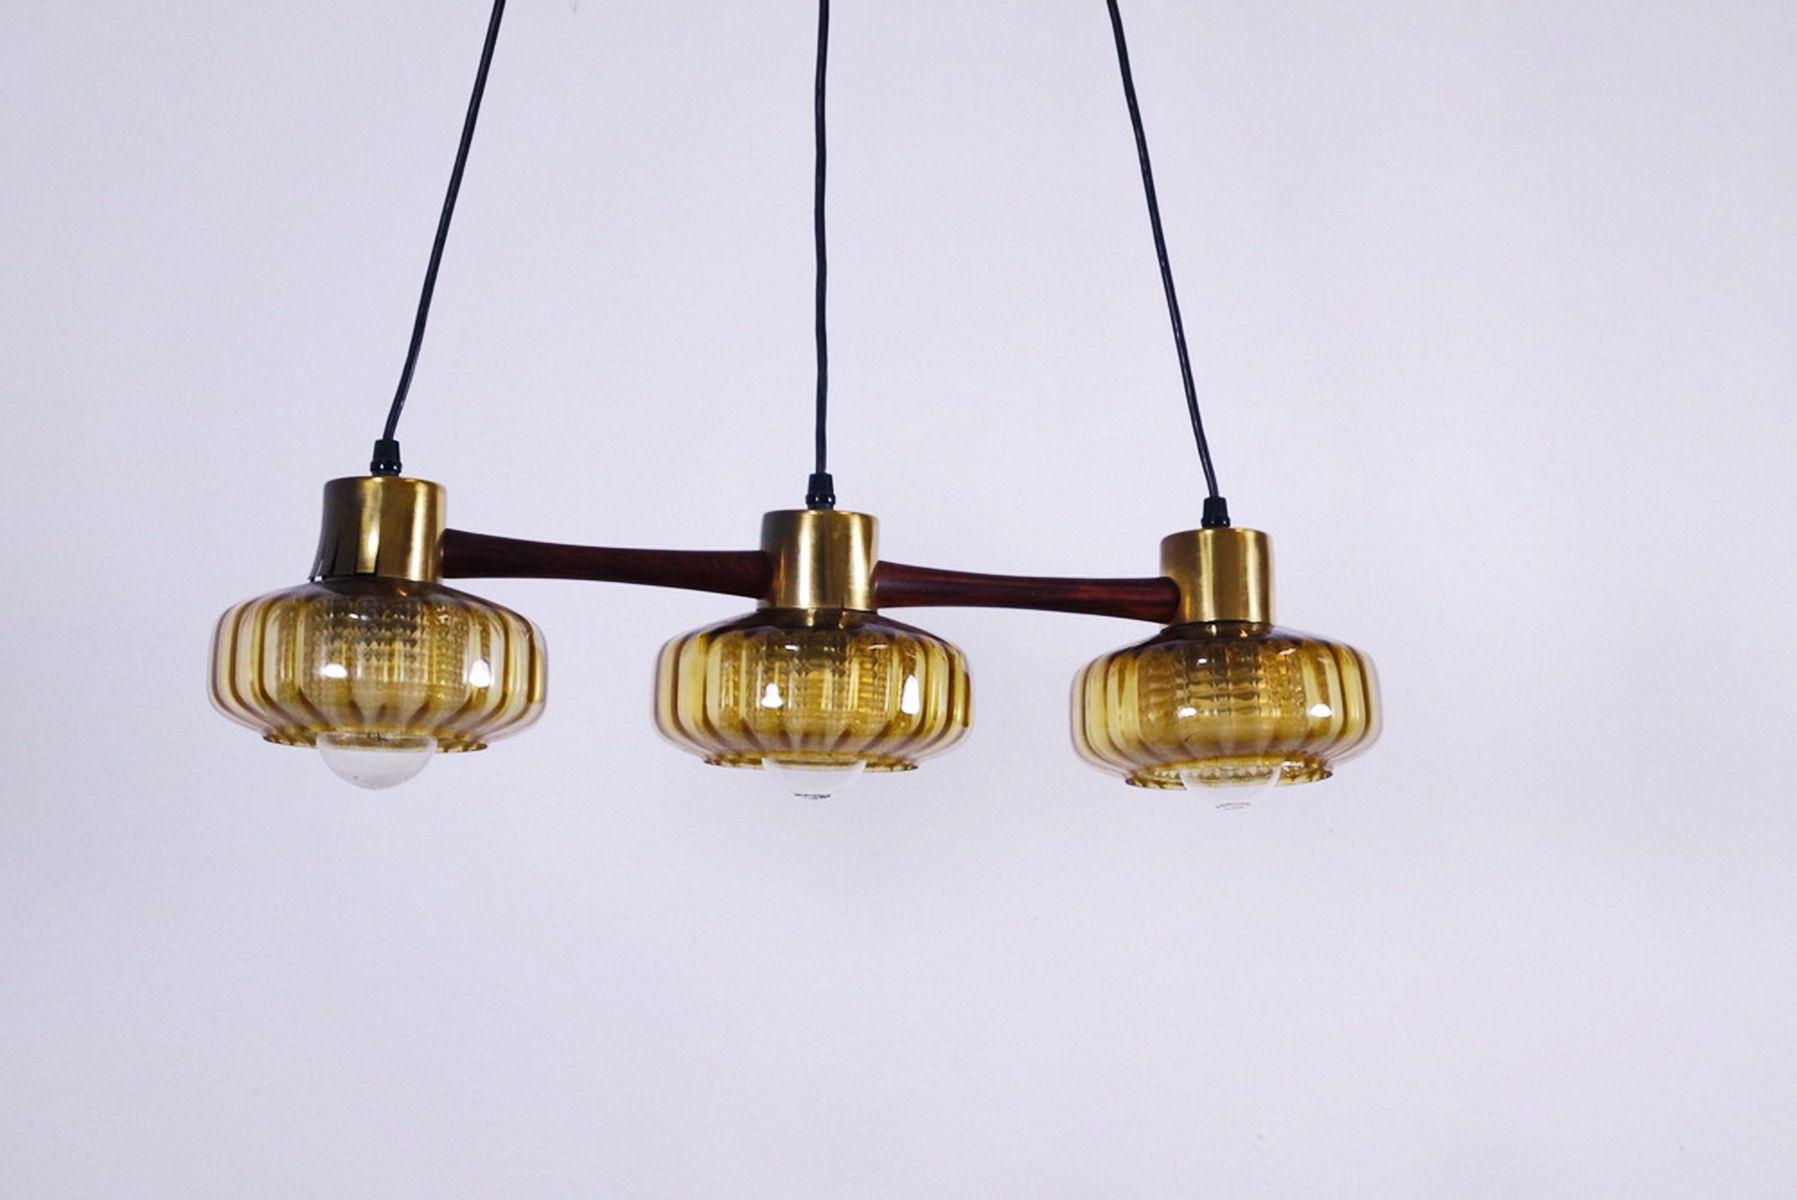 suspension lighting. Swedish Teak Suspension Lamp With Three Yellow Glass Diffusers, 1960s Lighting